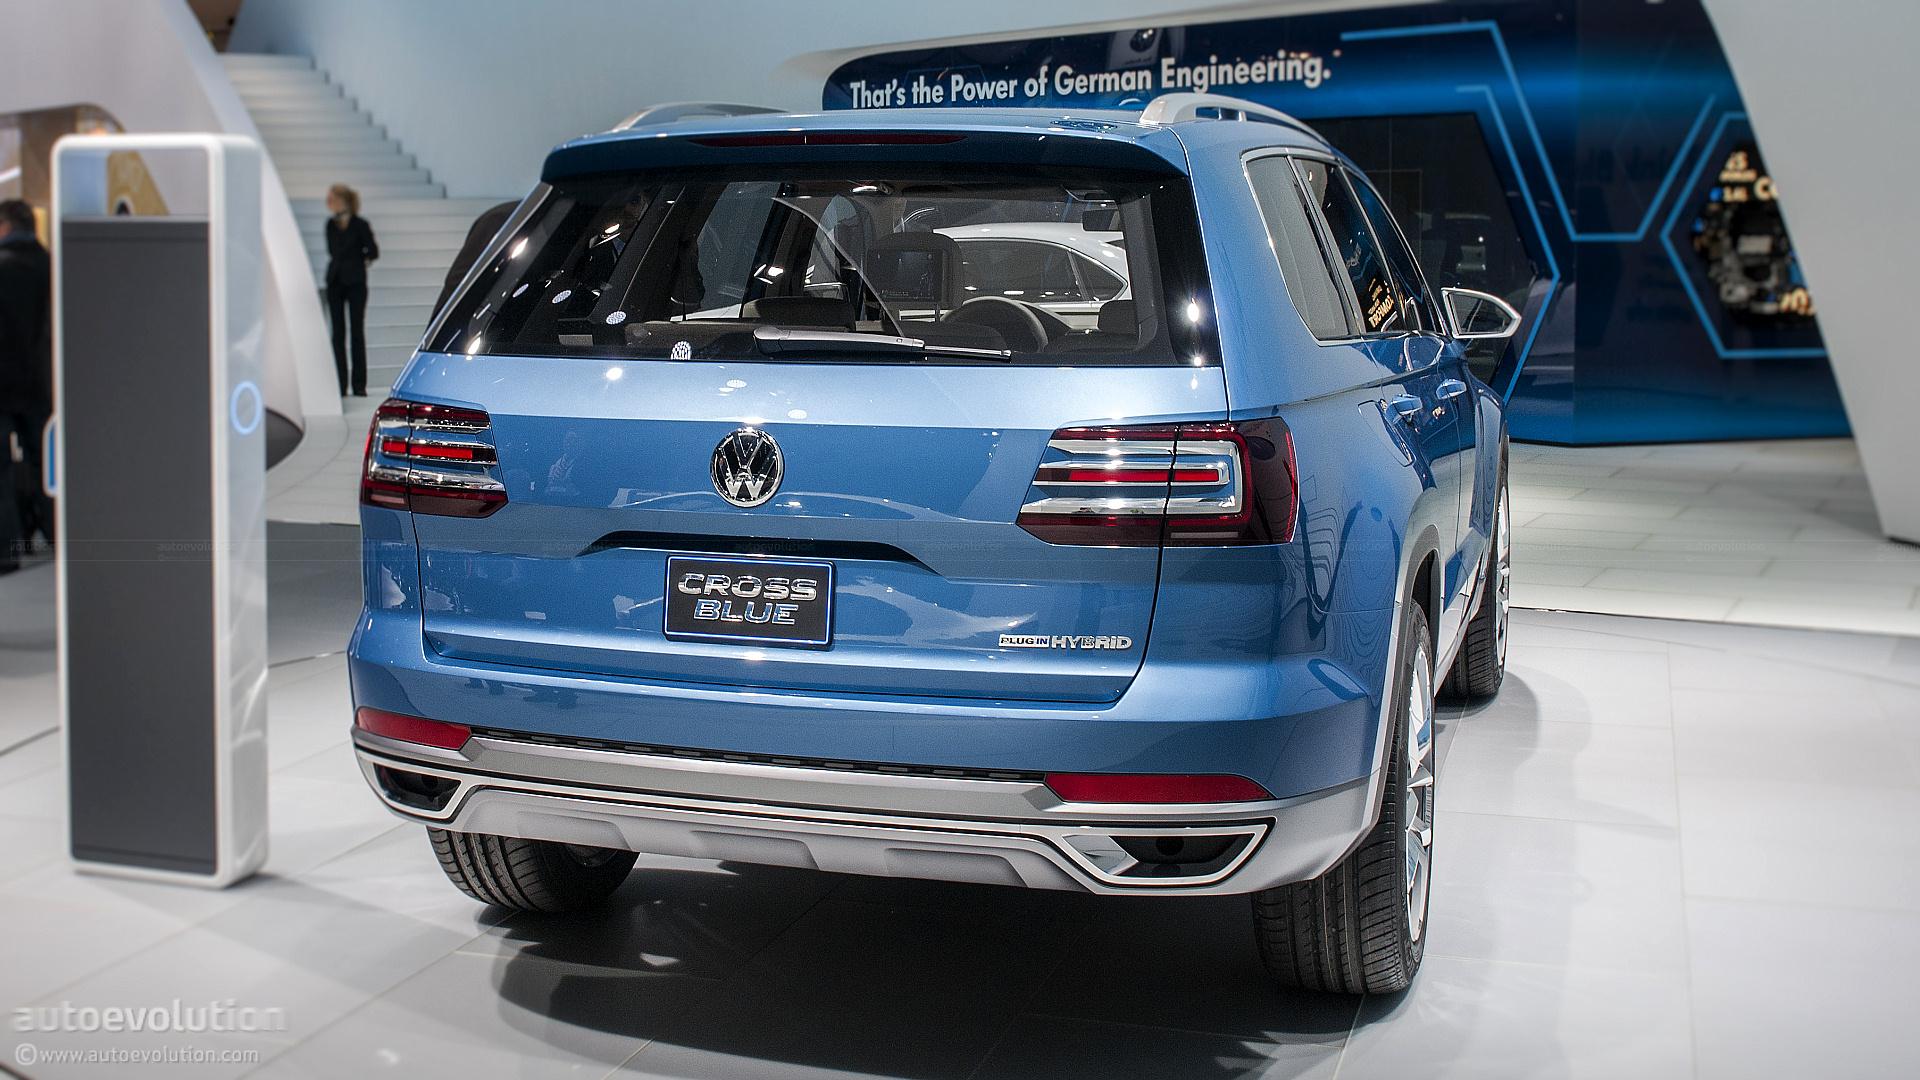 Volkswagen's New SUV Will Be Named Atlas, German Media Says ...